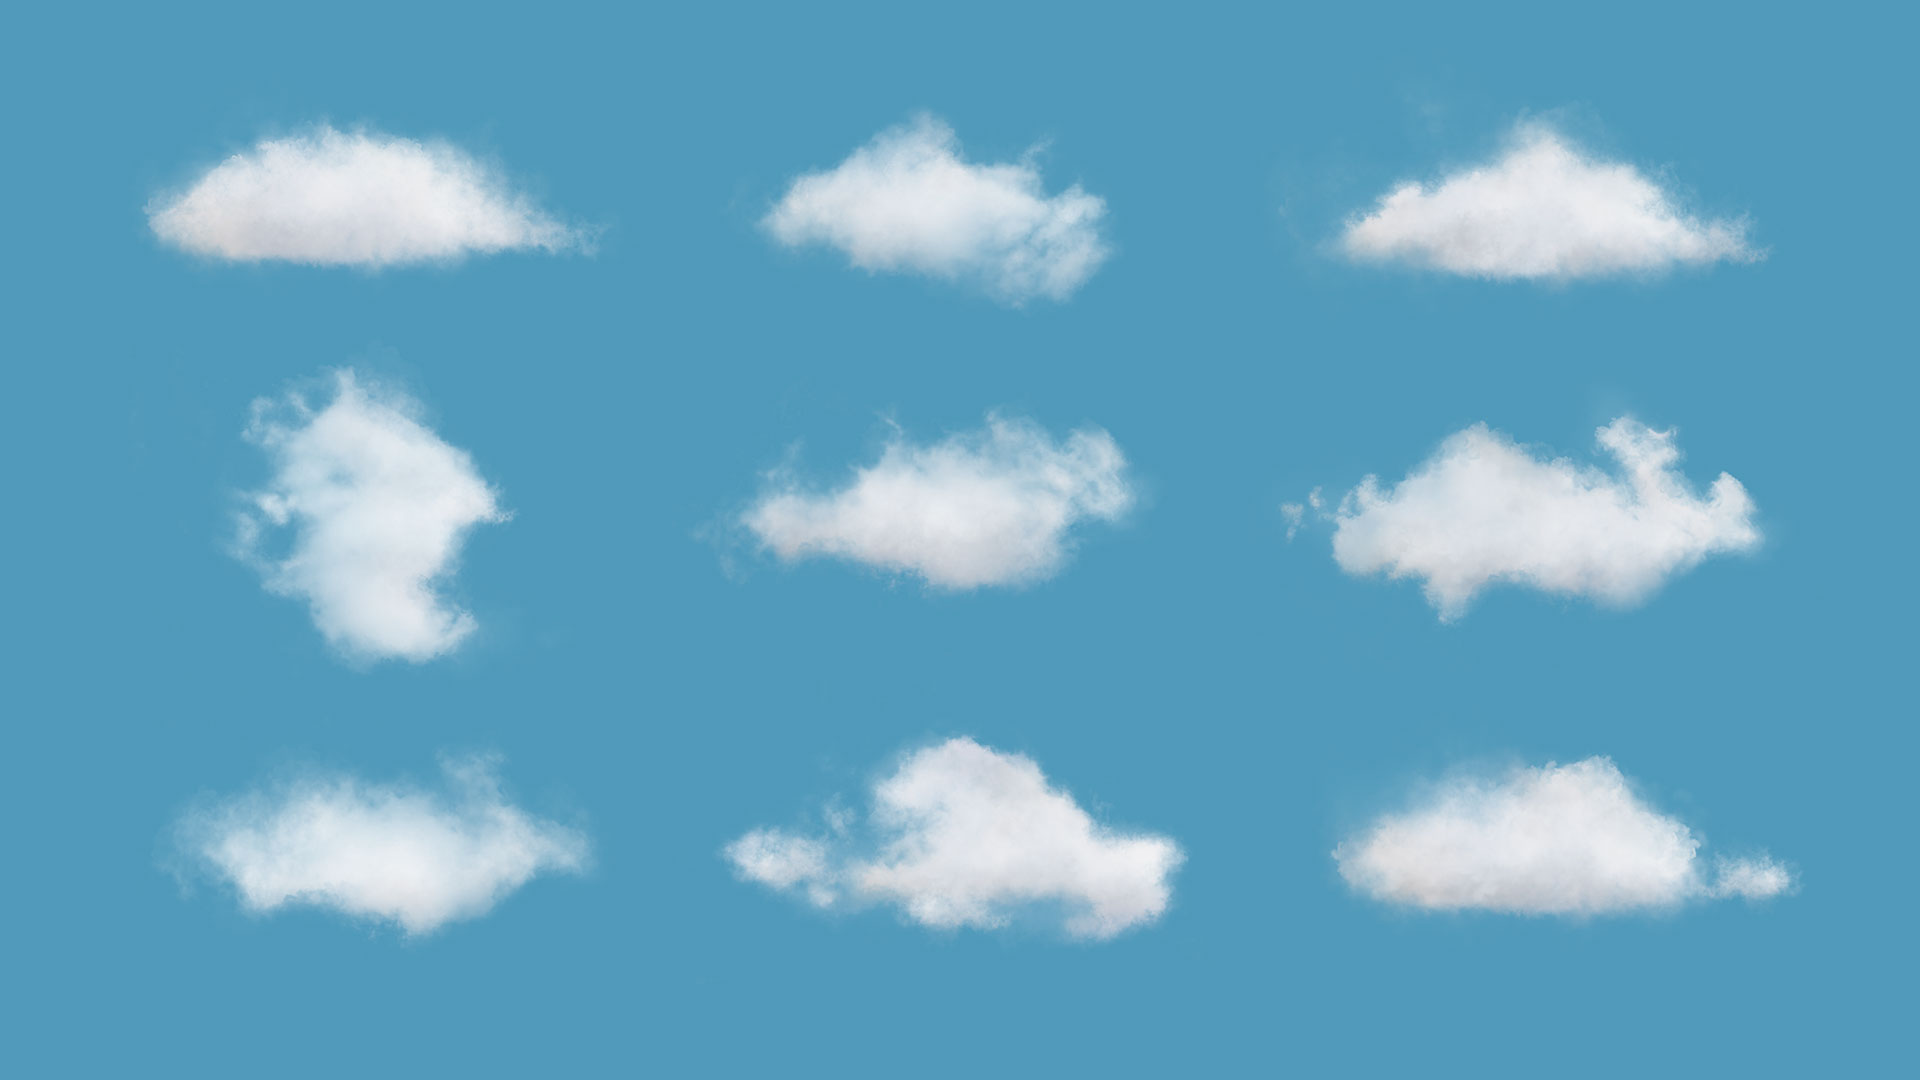 Qantas_Cloud_1920x1080